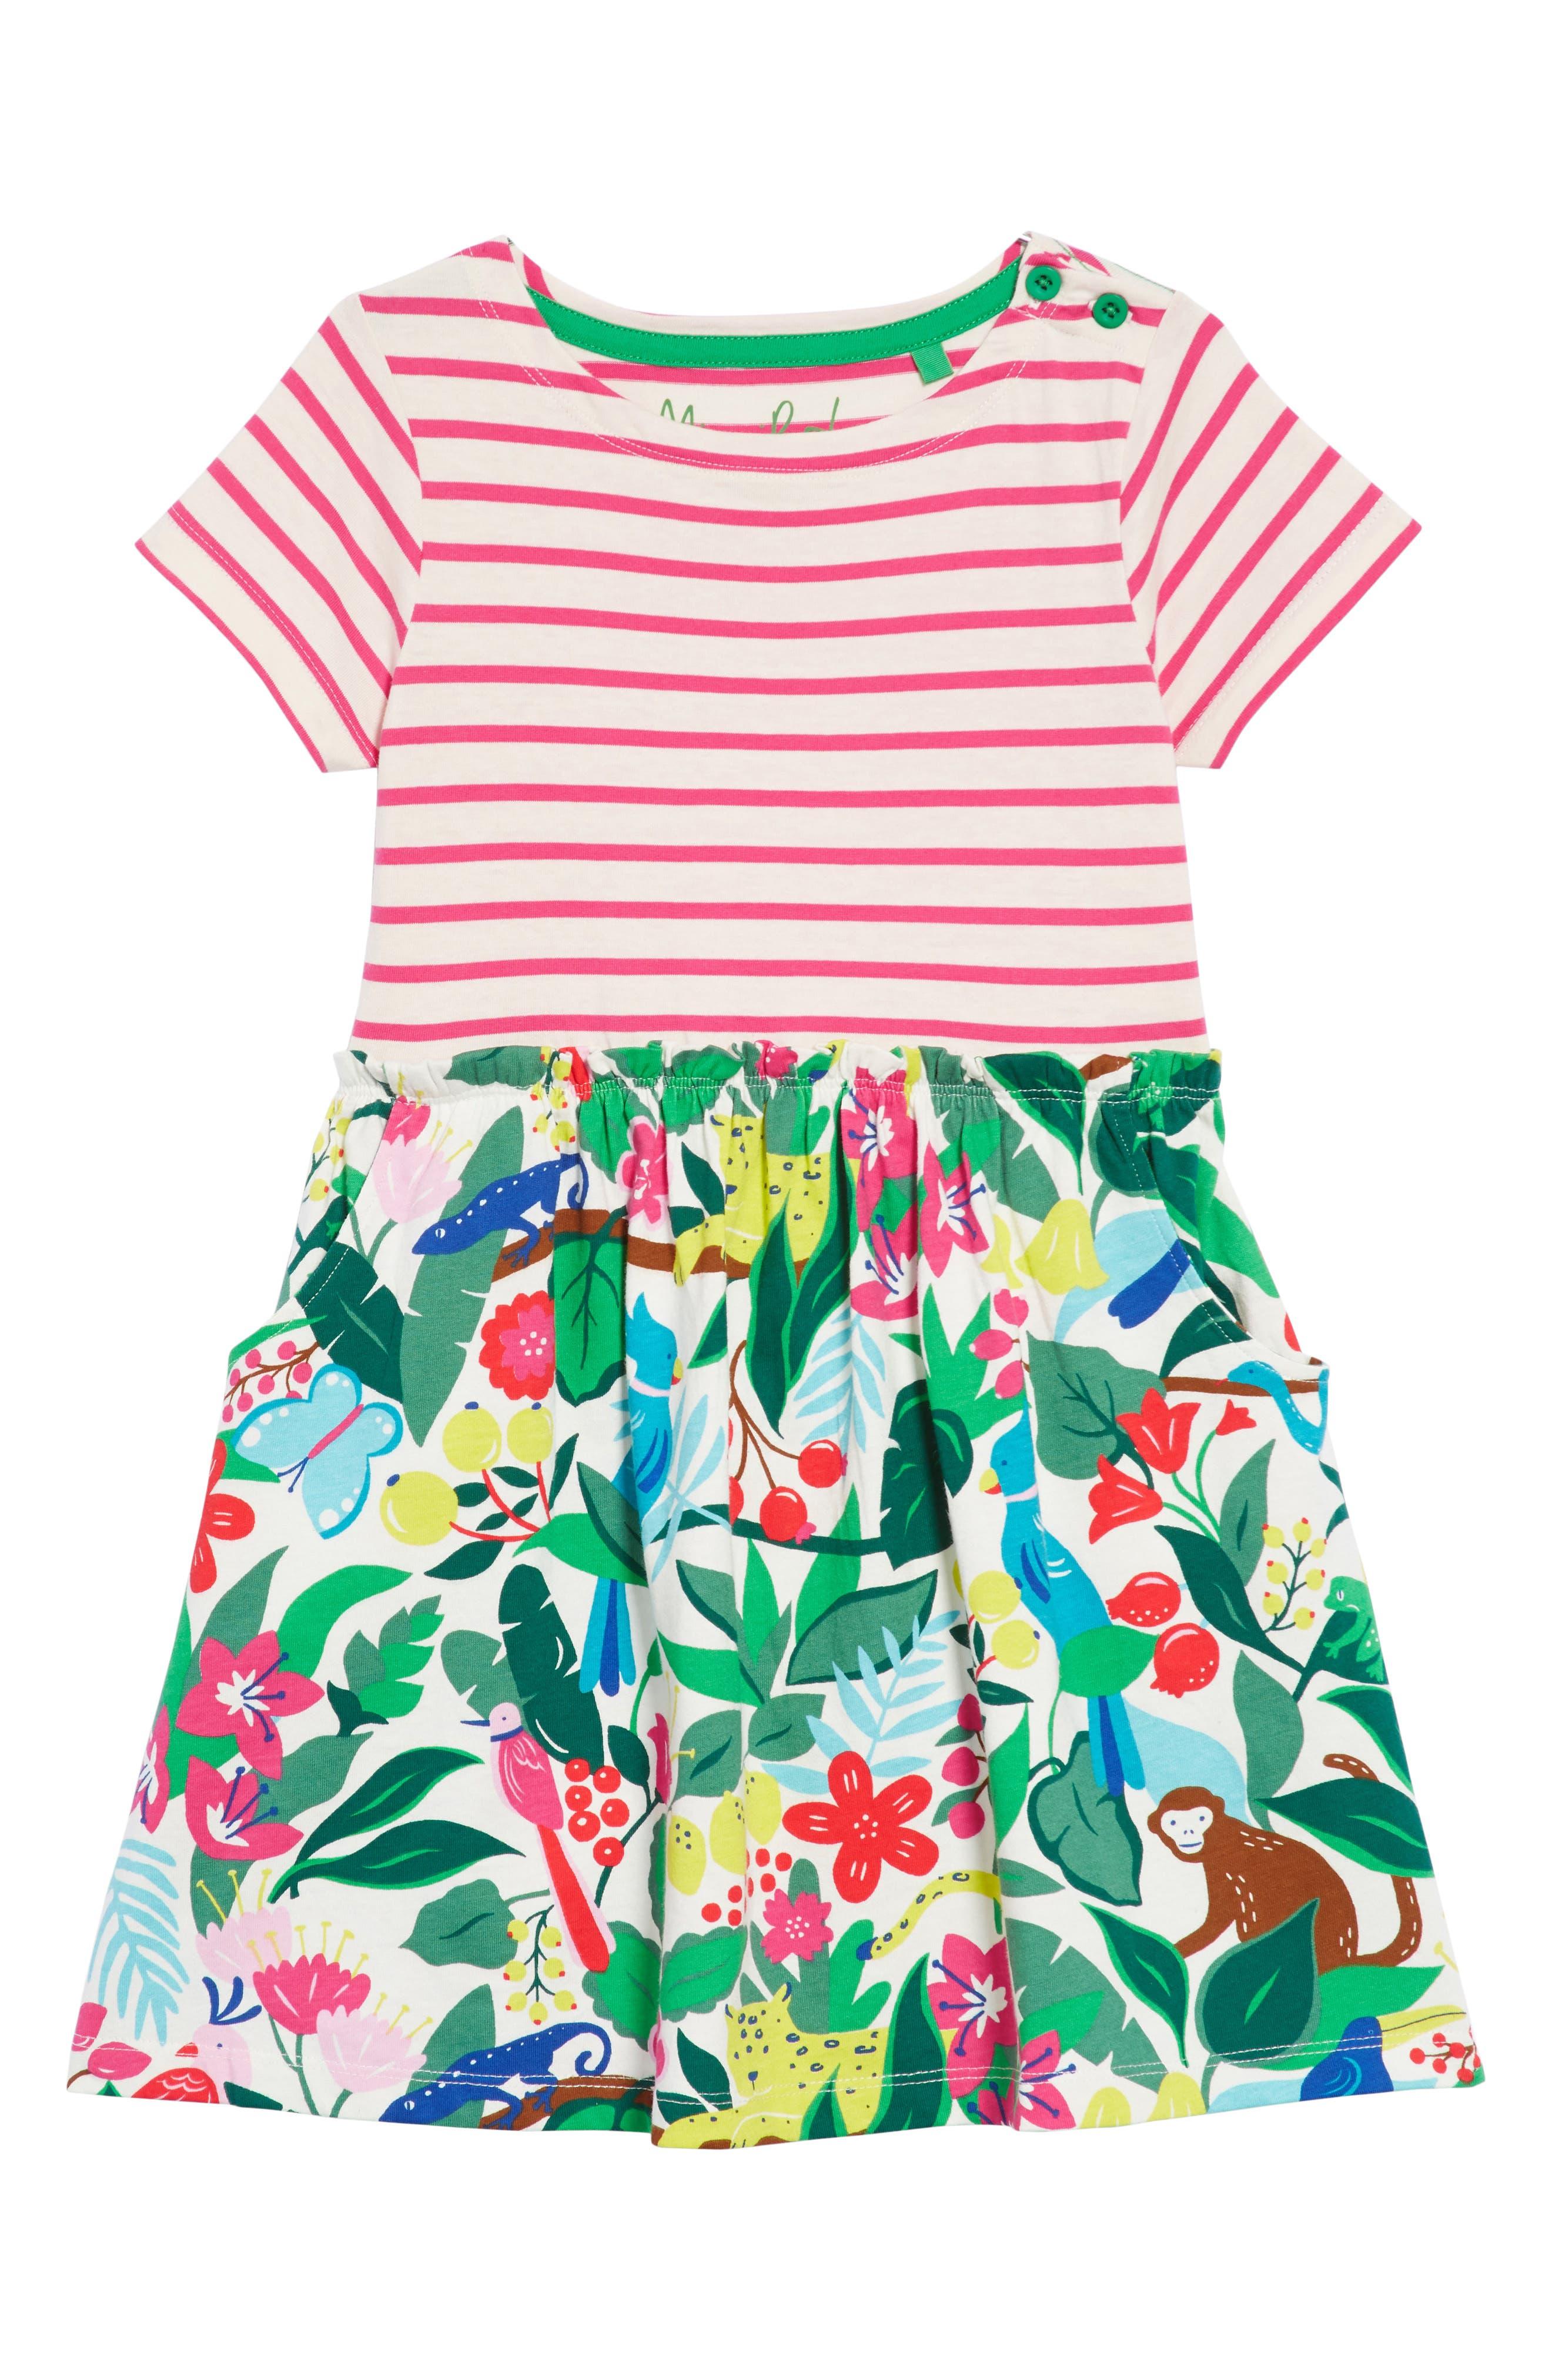 MINI BODEN Bright Hotchpotch Jersey Dress, Main, color, 901